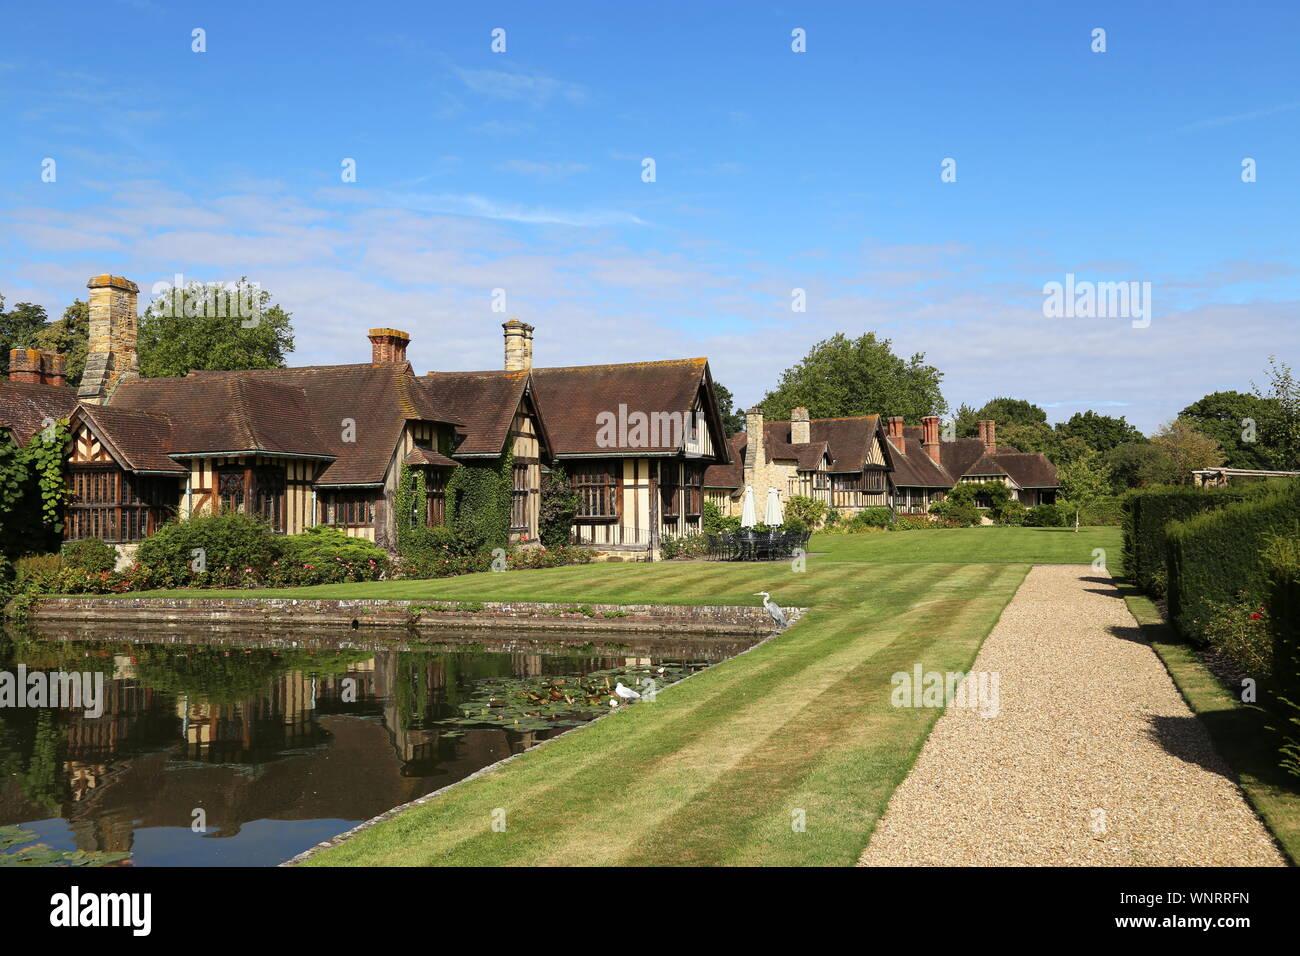 Astor Wing, Hever Castle, Hever, Edenbridge, Kent, England, Great Britain, United Kingdom, UK, Europe Stock Photo